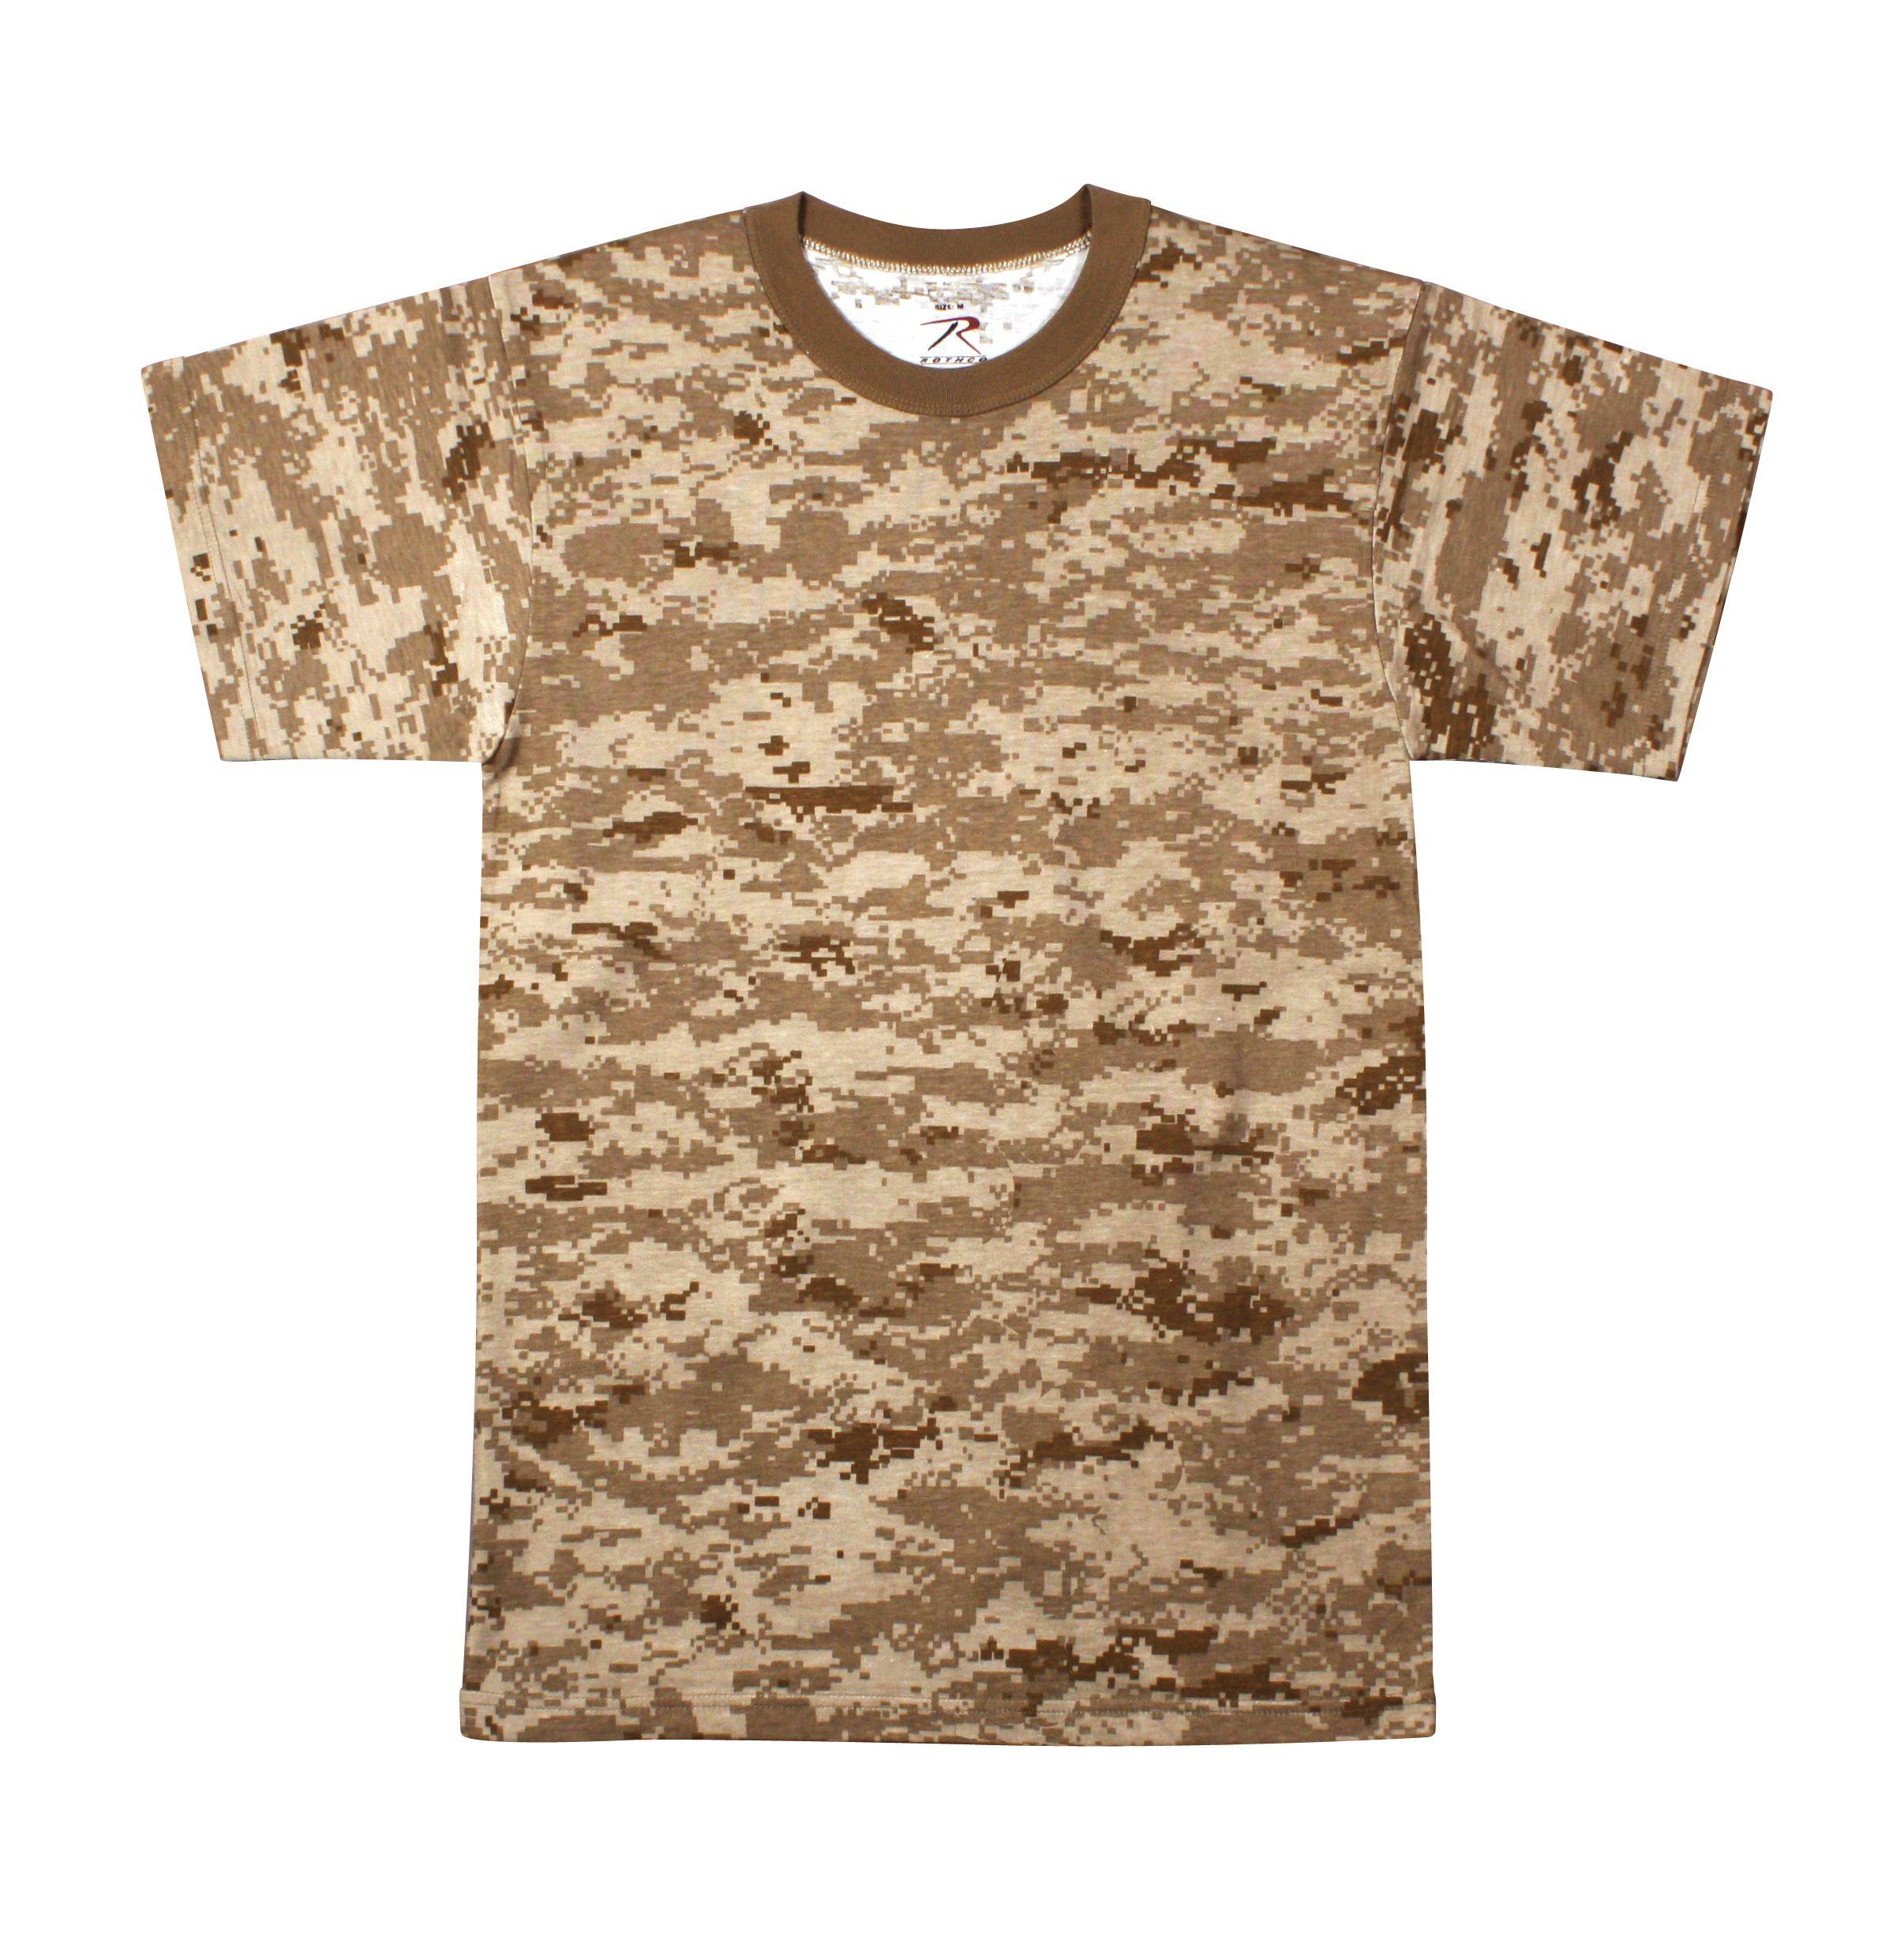 4dac1340 Buy Rothco Kids Digital Camo T-Shirt - Rothco Online at Best price - VA